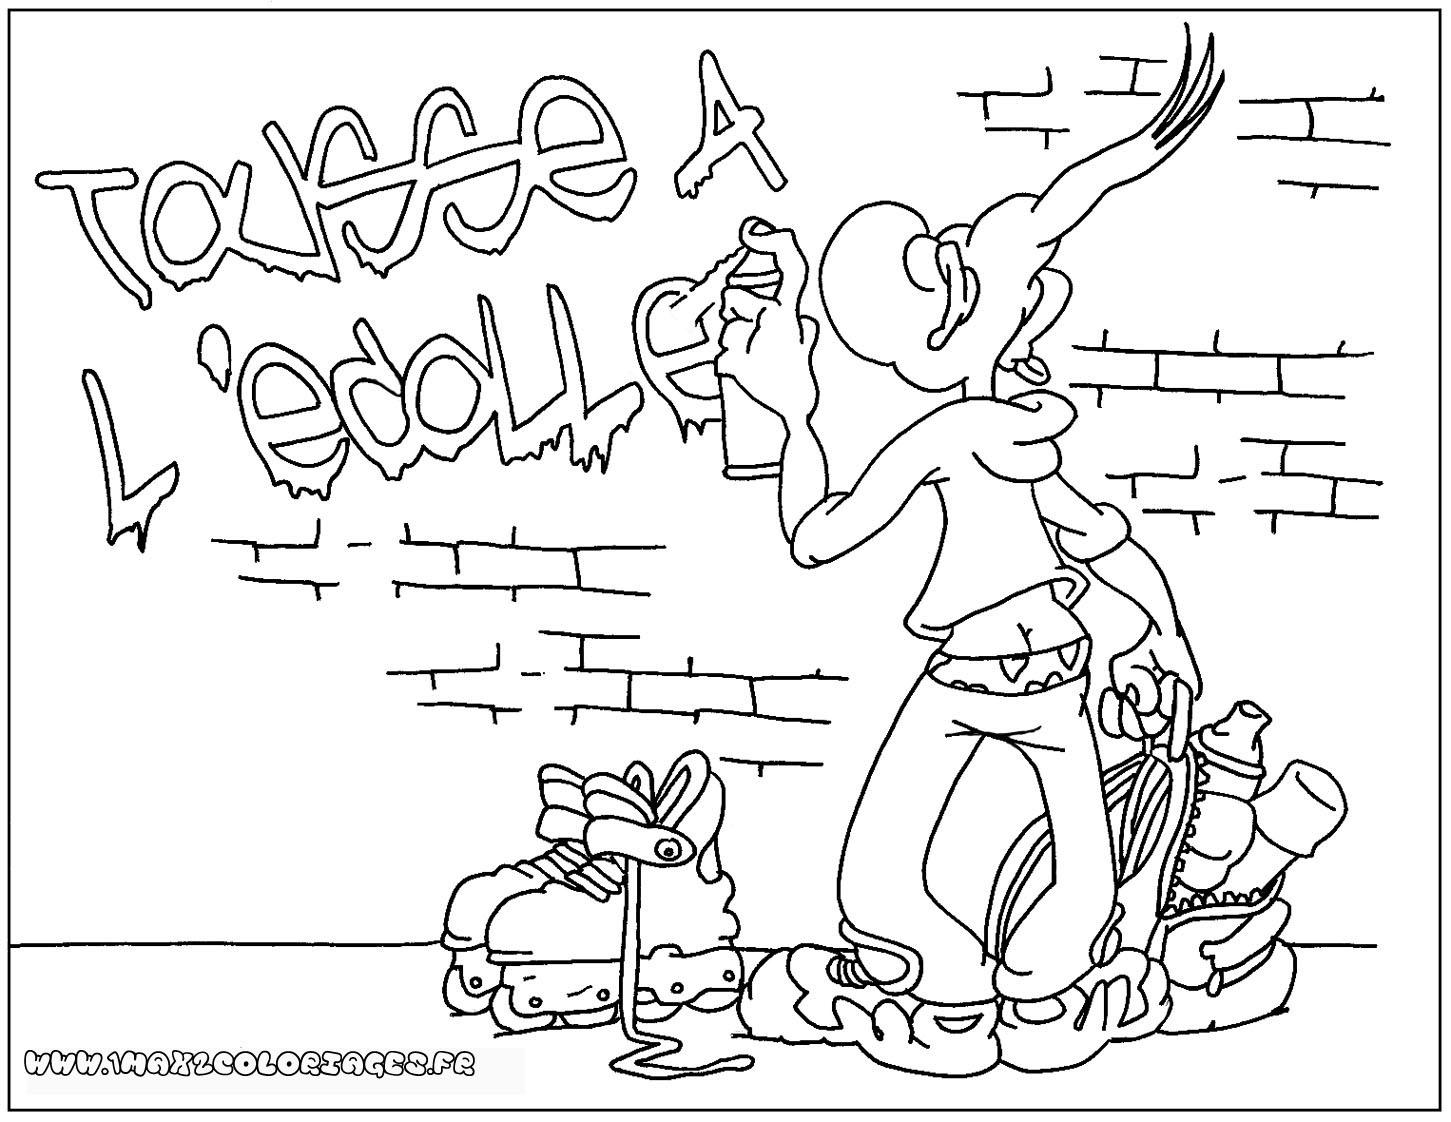 Dragon ball z dessin a colorier goku super saiyen 4 - Coloriage graffiti ...